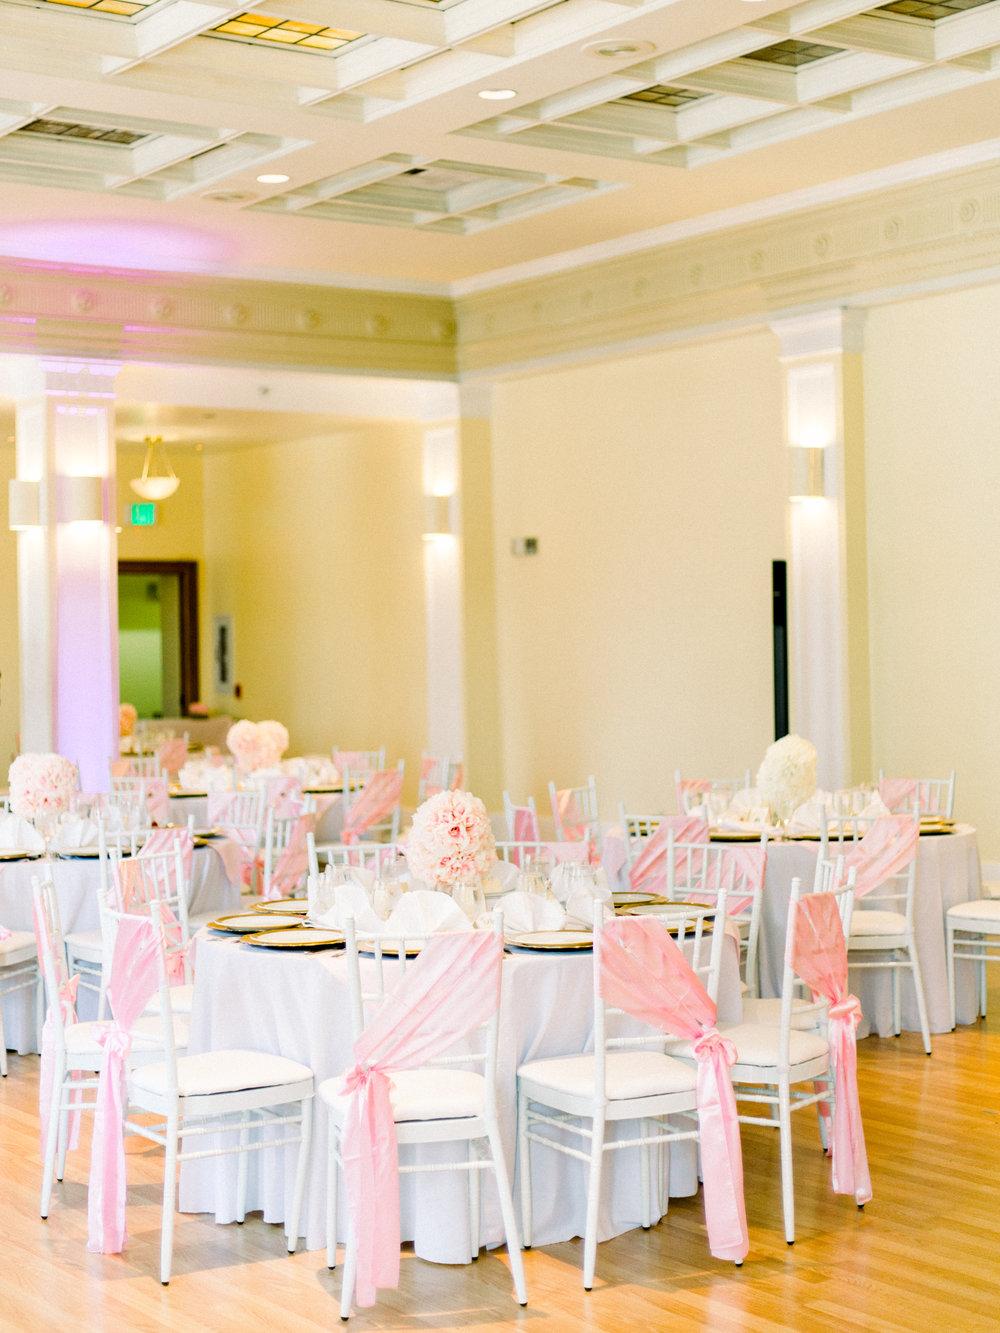 katie_graham_photography_wedding_seattle_washington_monte_cristo_ballroom_photography